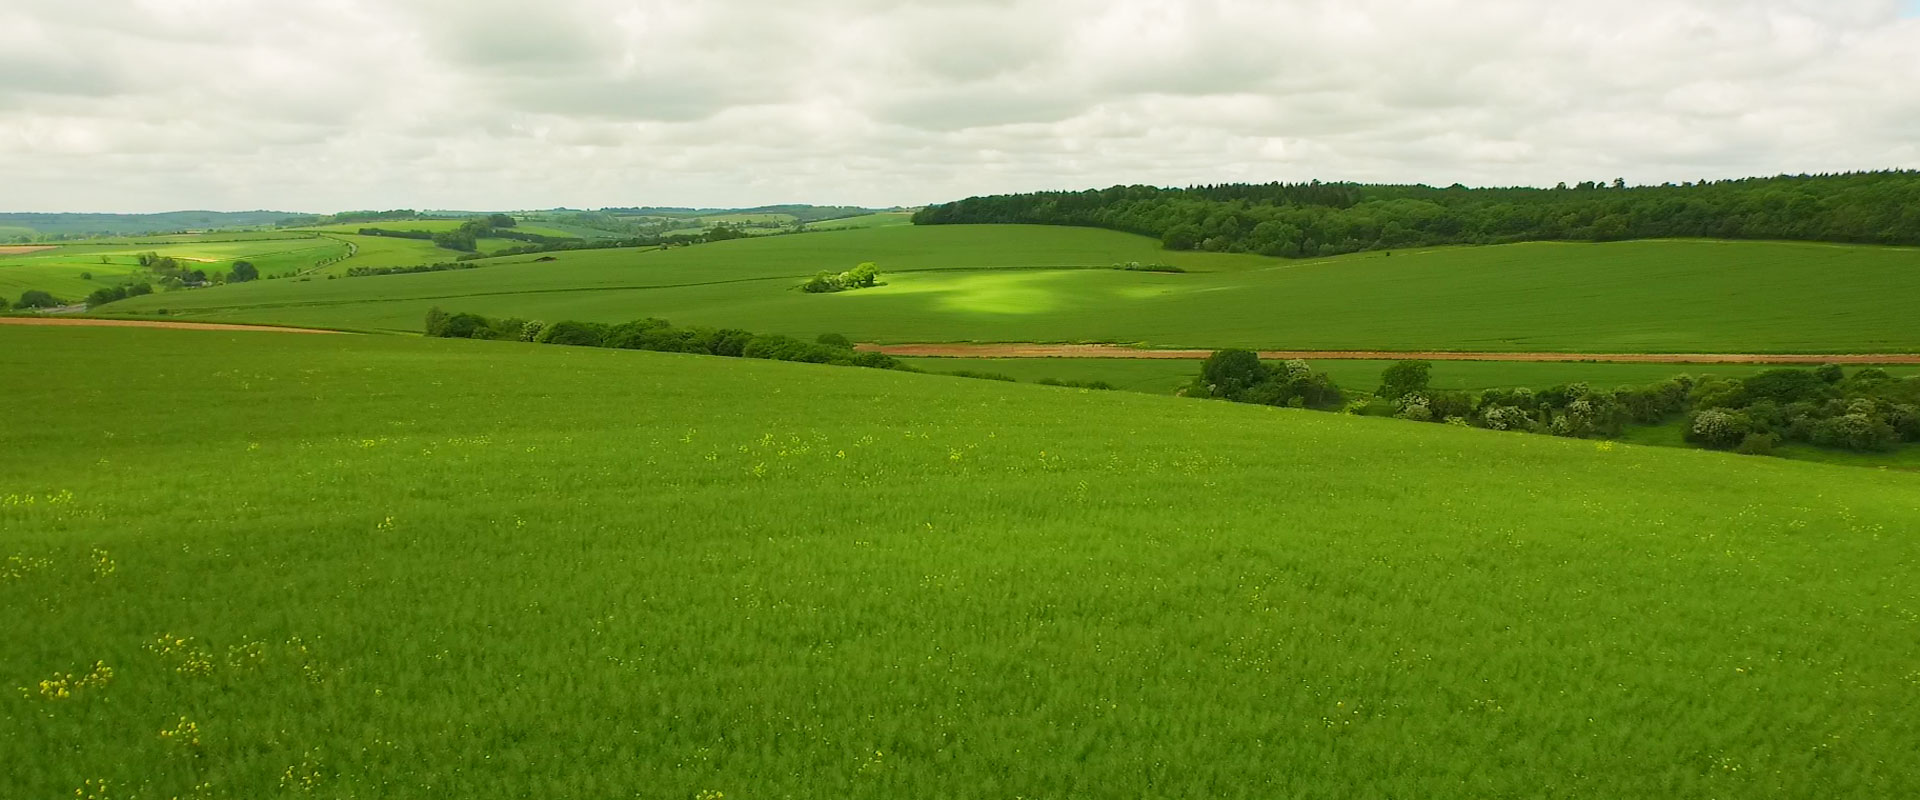 Green-footprint-3.jpg